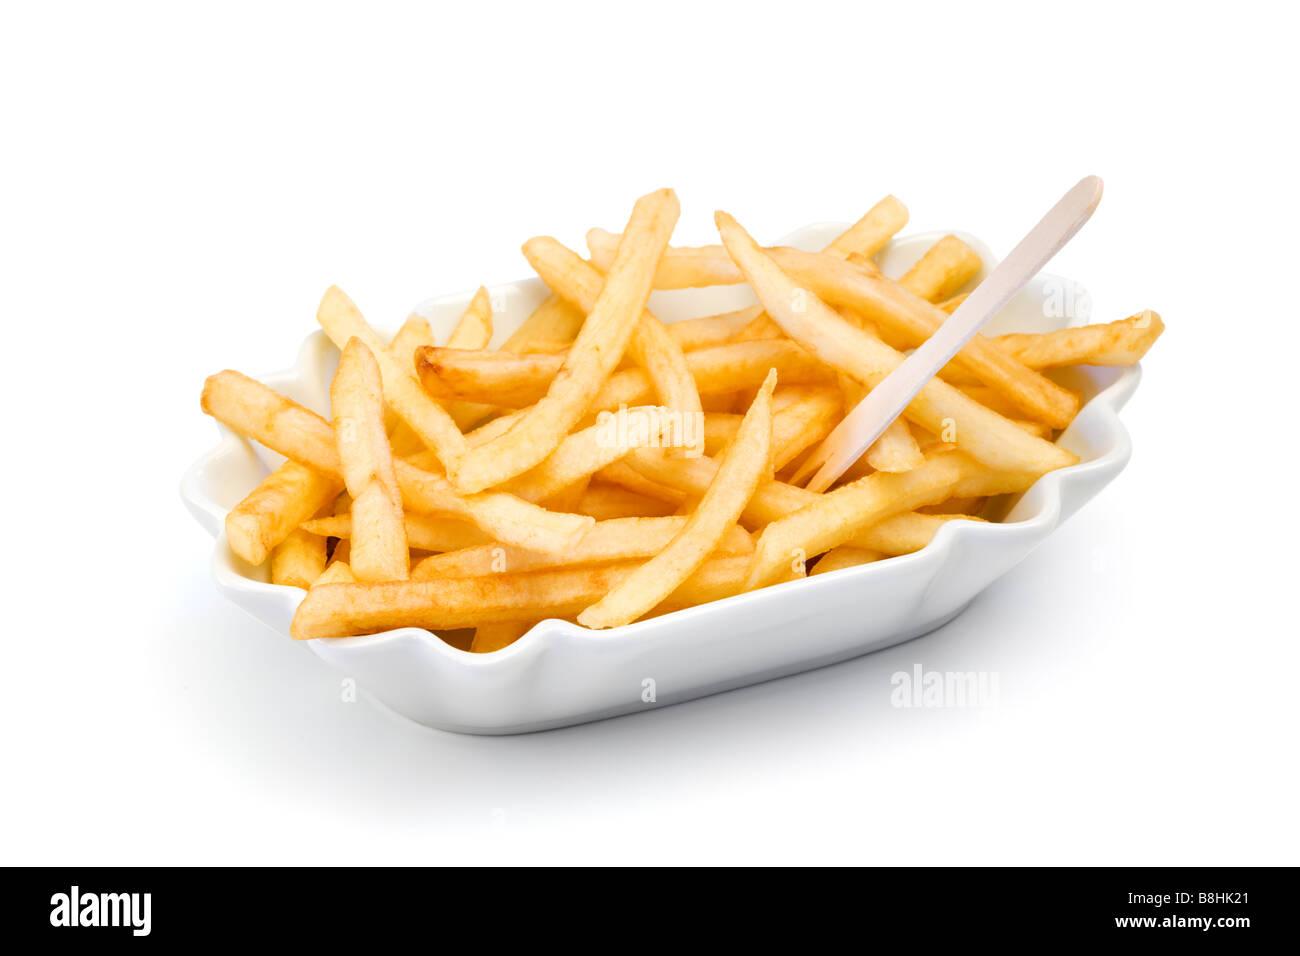 Fastfood Pommes frites in Keramikschale Ausschnitt Stockbild